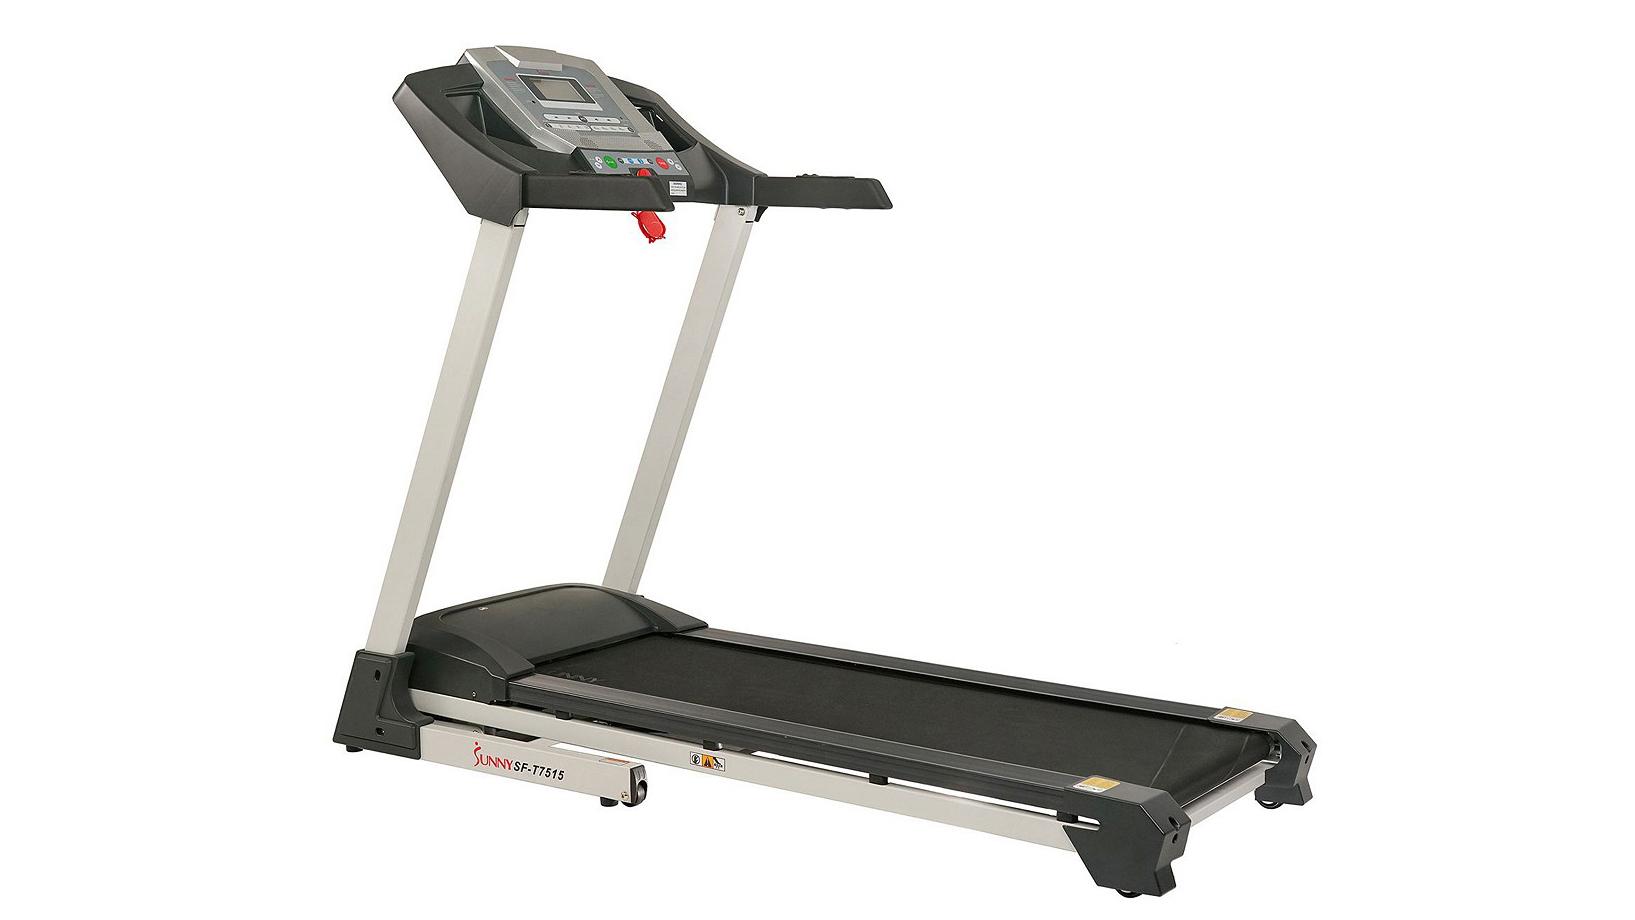 Sunny t7515 Treadmill